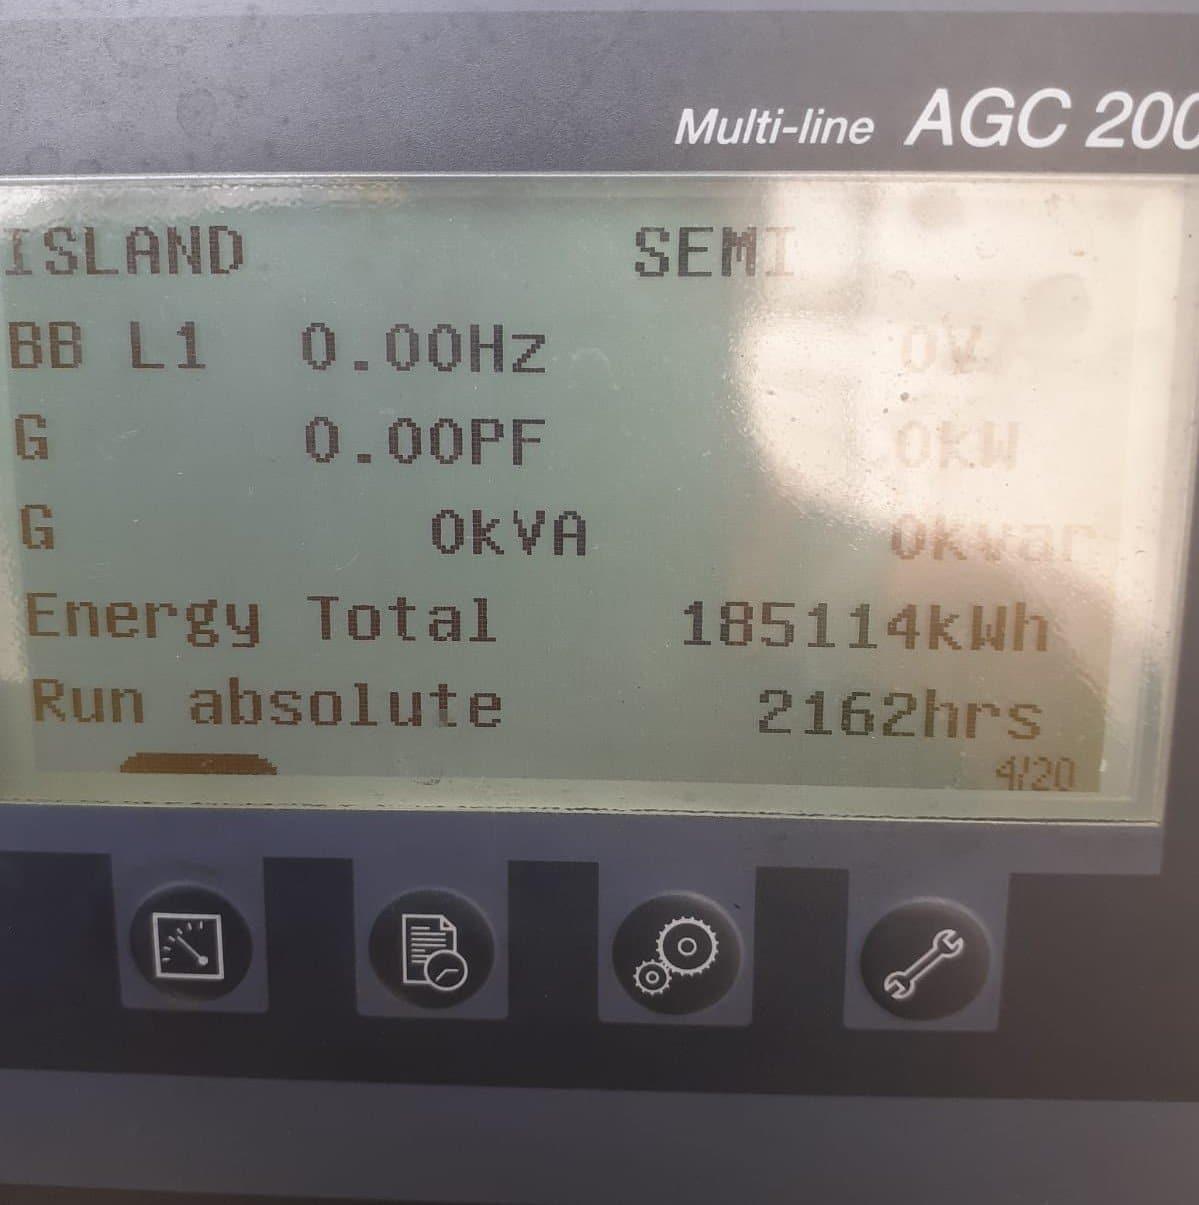 800 FG Wilson, Perkins/Stamford Generator usage hours